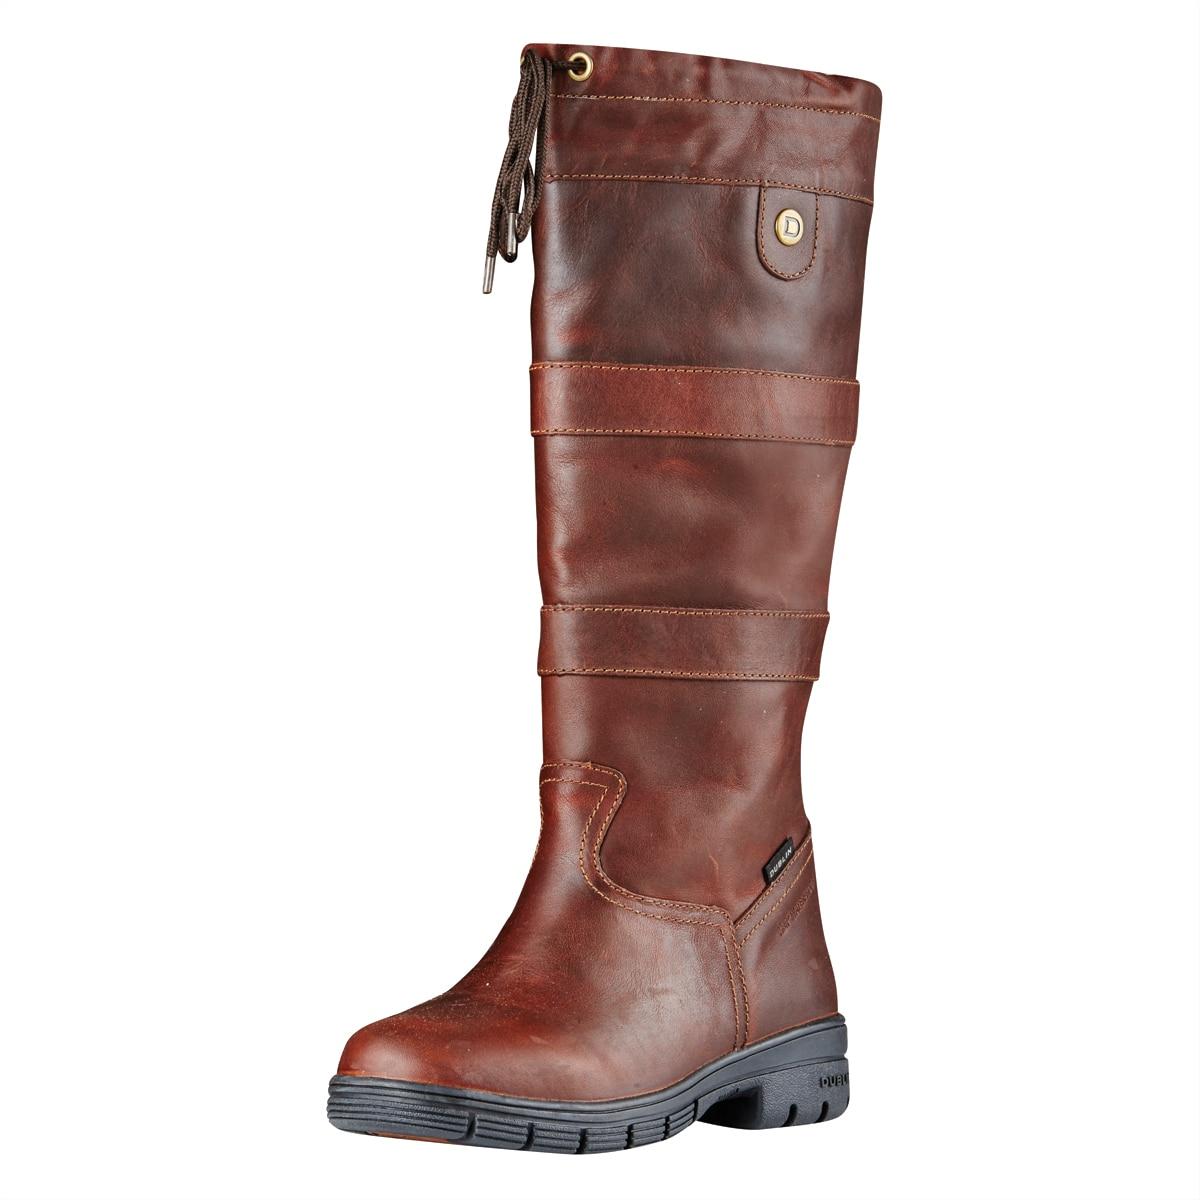 NEW Dublin River Grain Boots Various Sizes Black